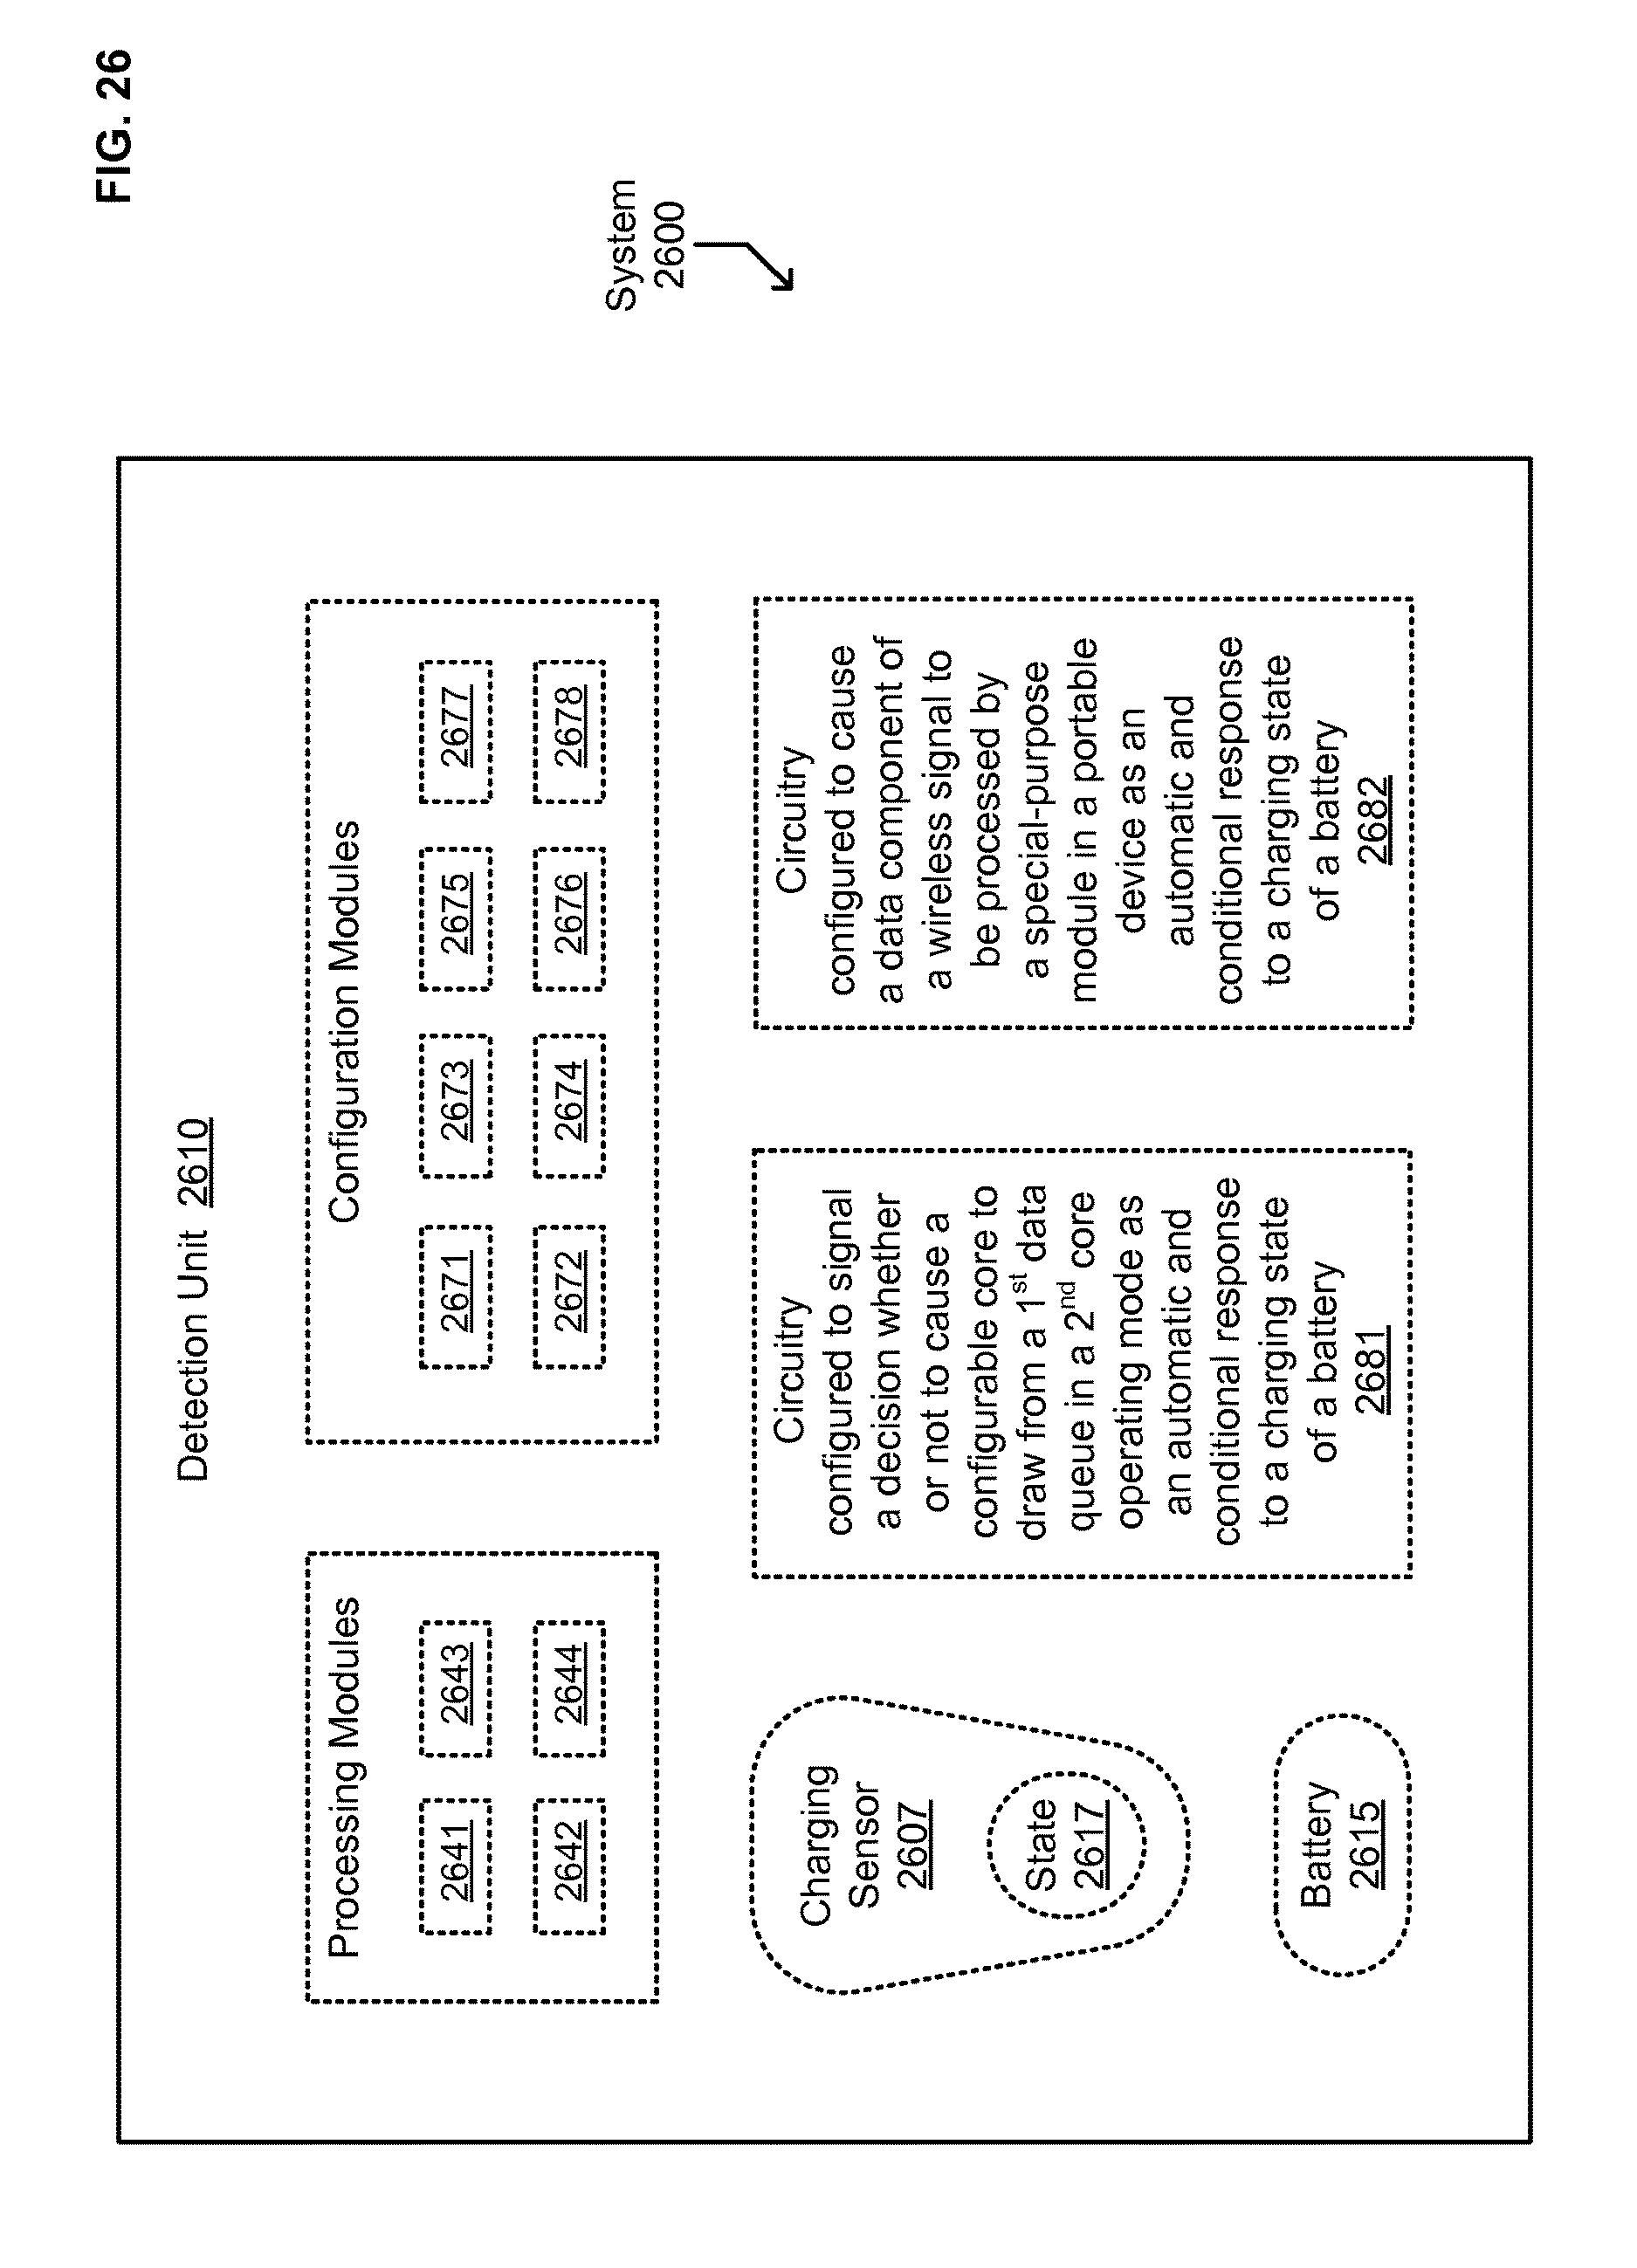 Patent US 9,781,664 B2